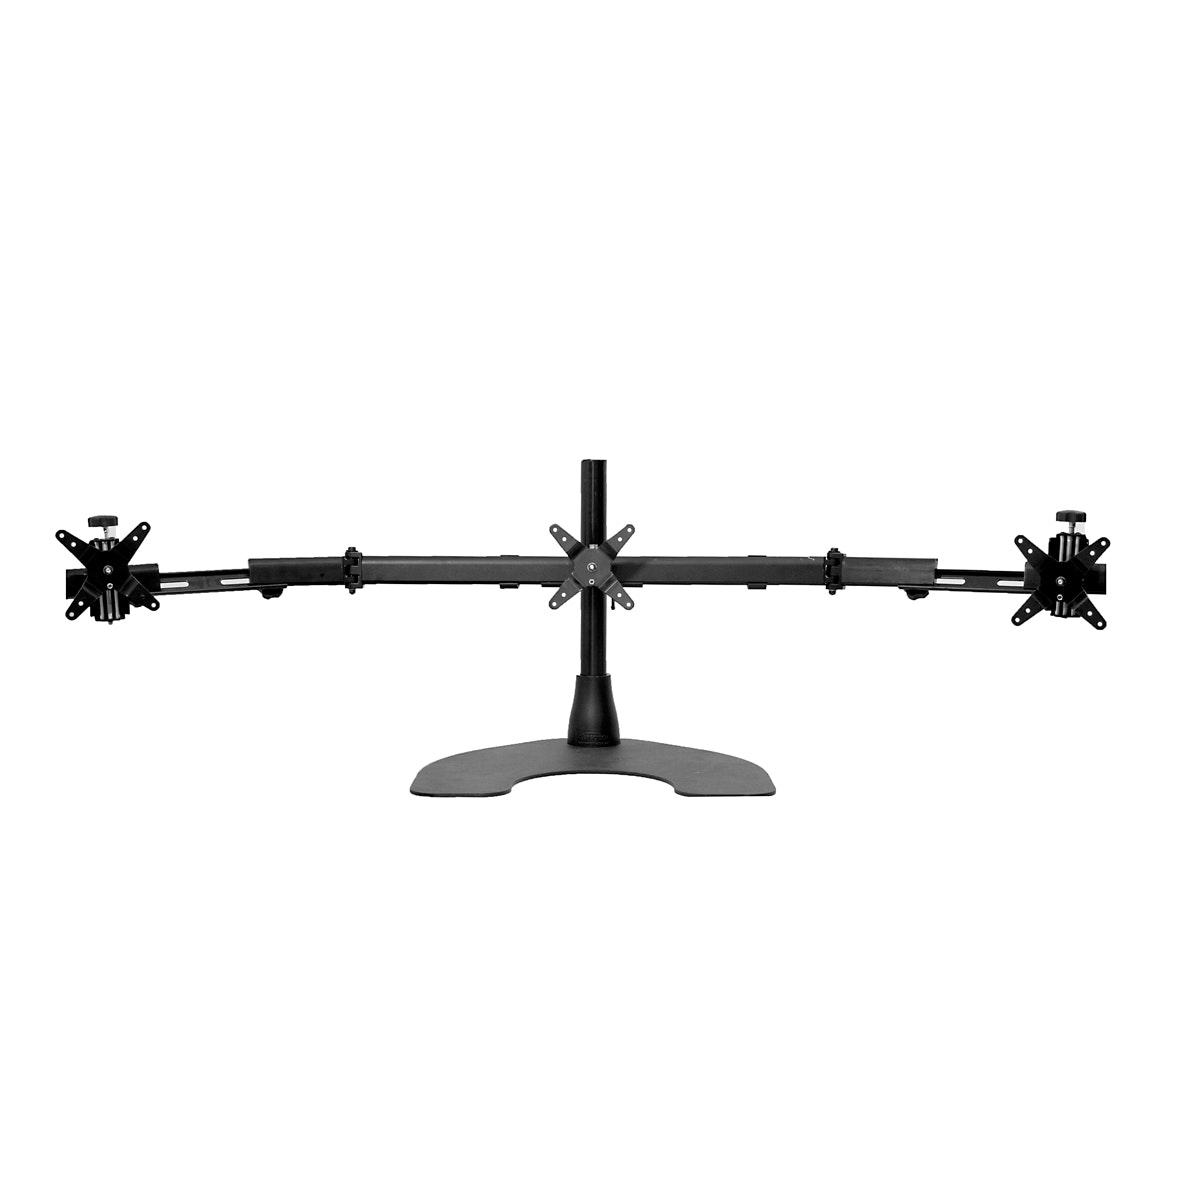 Ergotech Freestanding Triple Monitor Stand